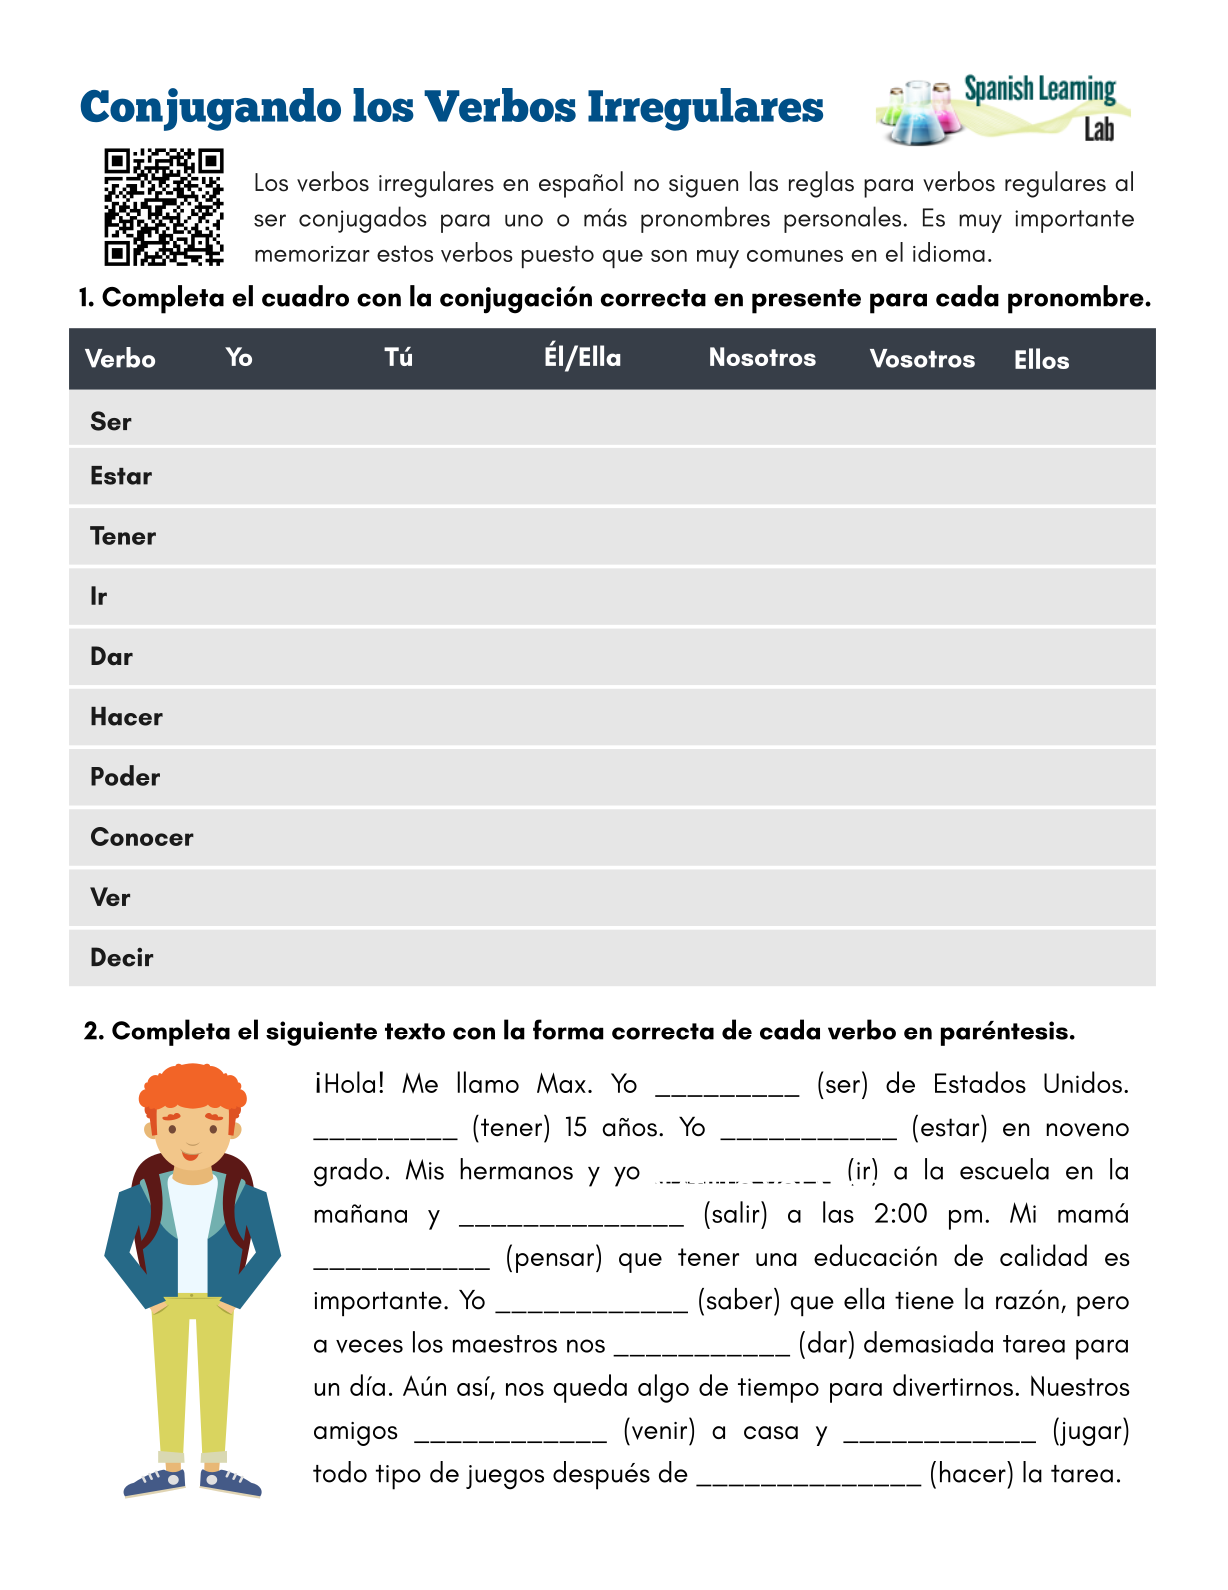 Conjugating Irregular Verbs In Spanish Pdf Worksheet Spanish Worksheets Spanish Classroom Activities Irregular Verbs